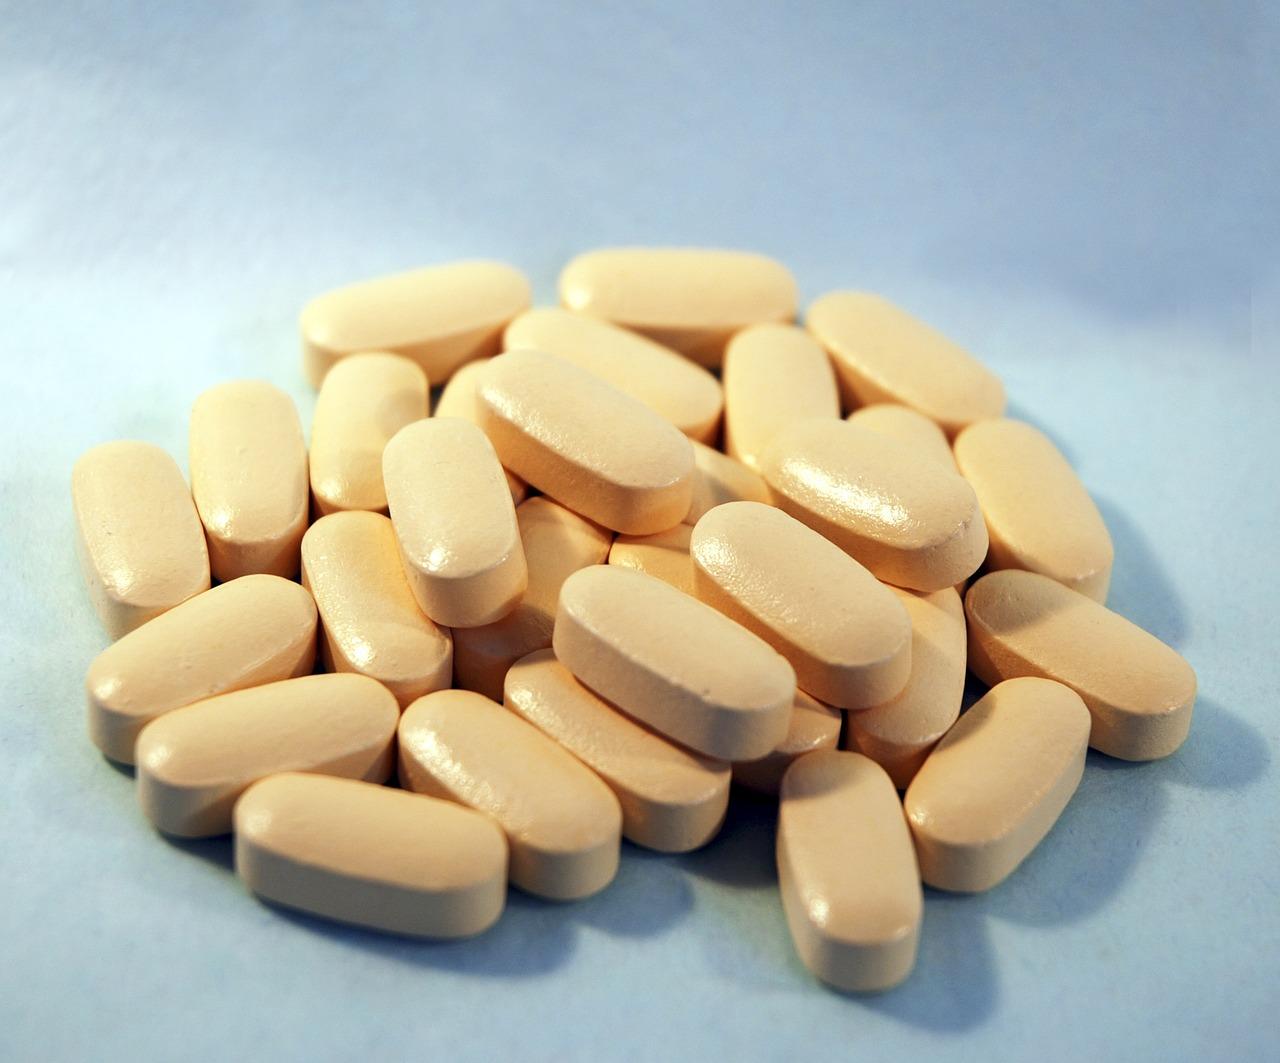 Medicine-Health-Medical-Pills-Medication-Drug-1800347.jpg